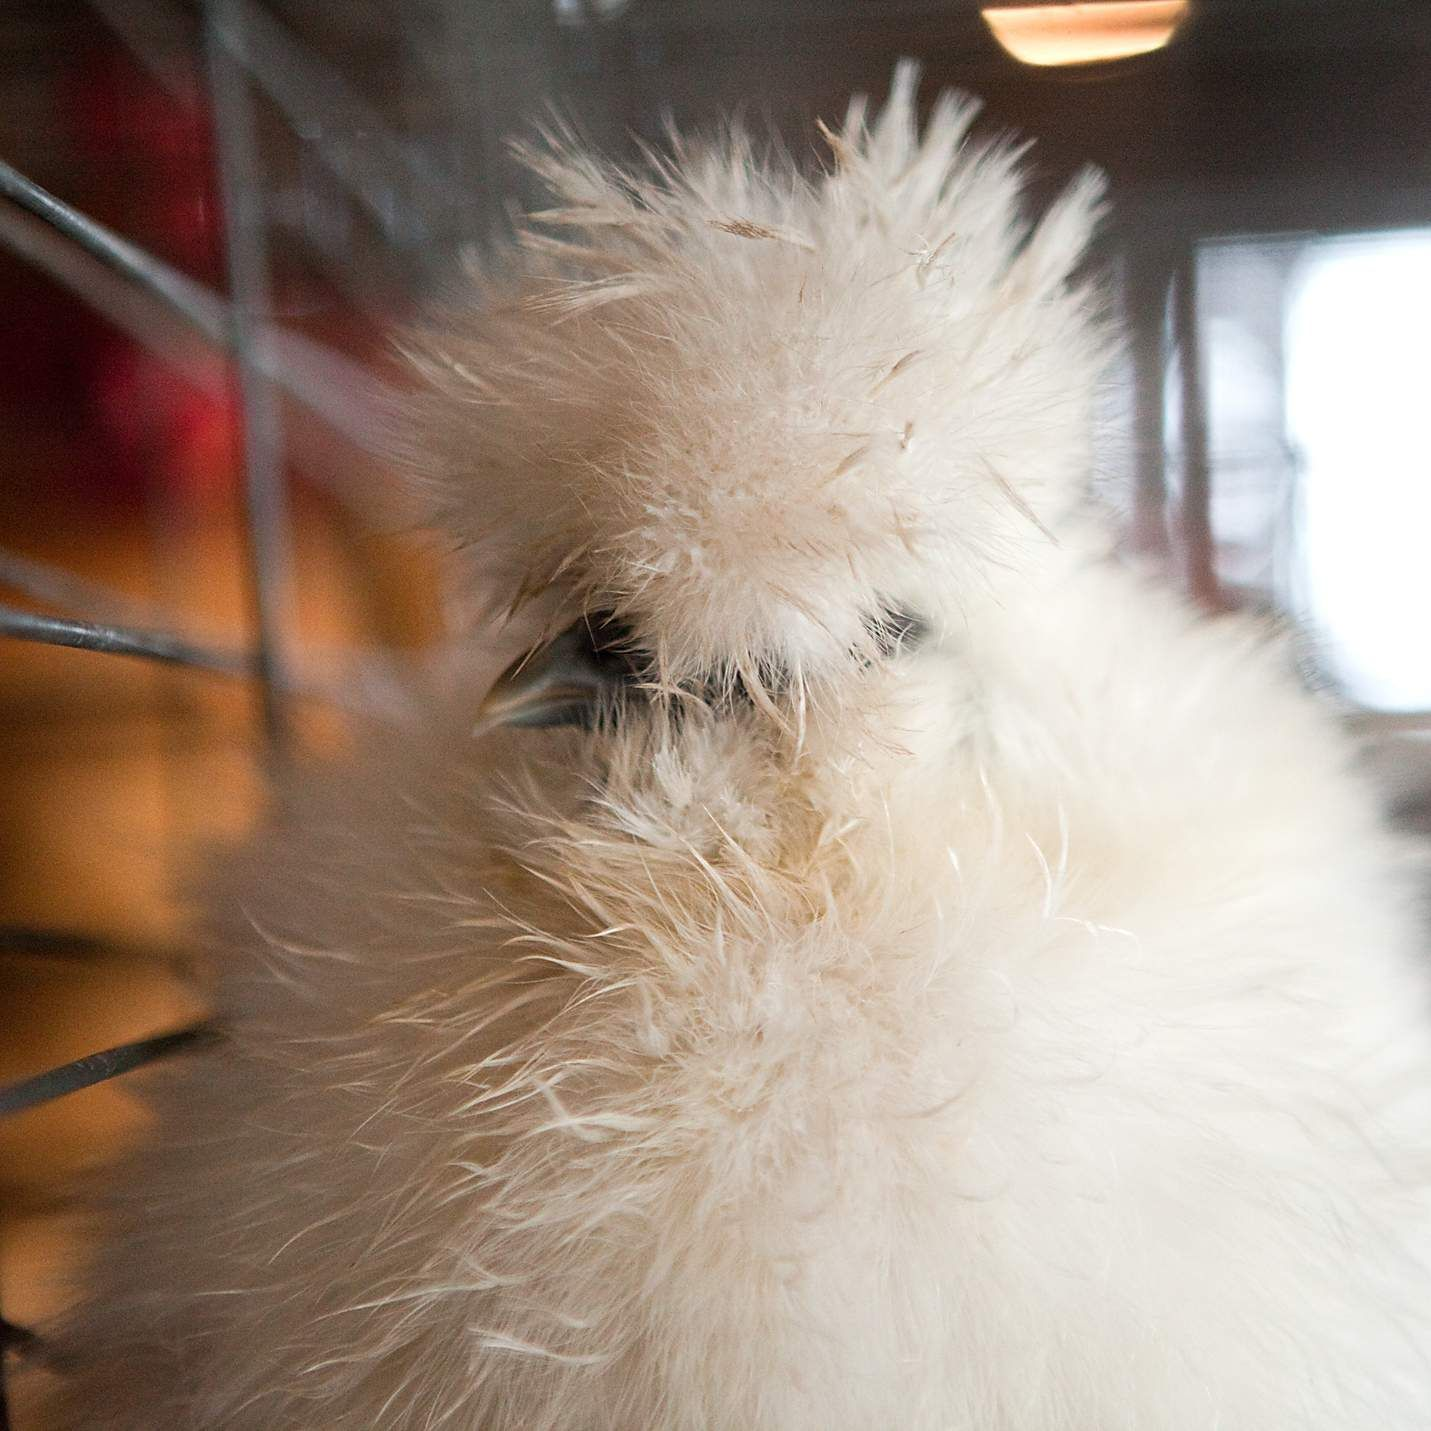 This is my friend whitneyk123 's chicken isn't she beautiful!!